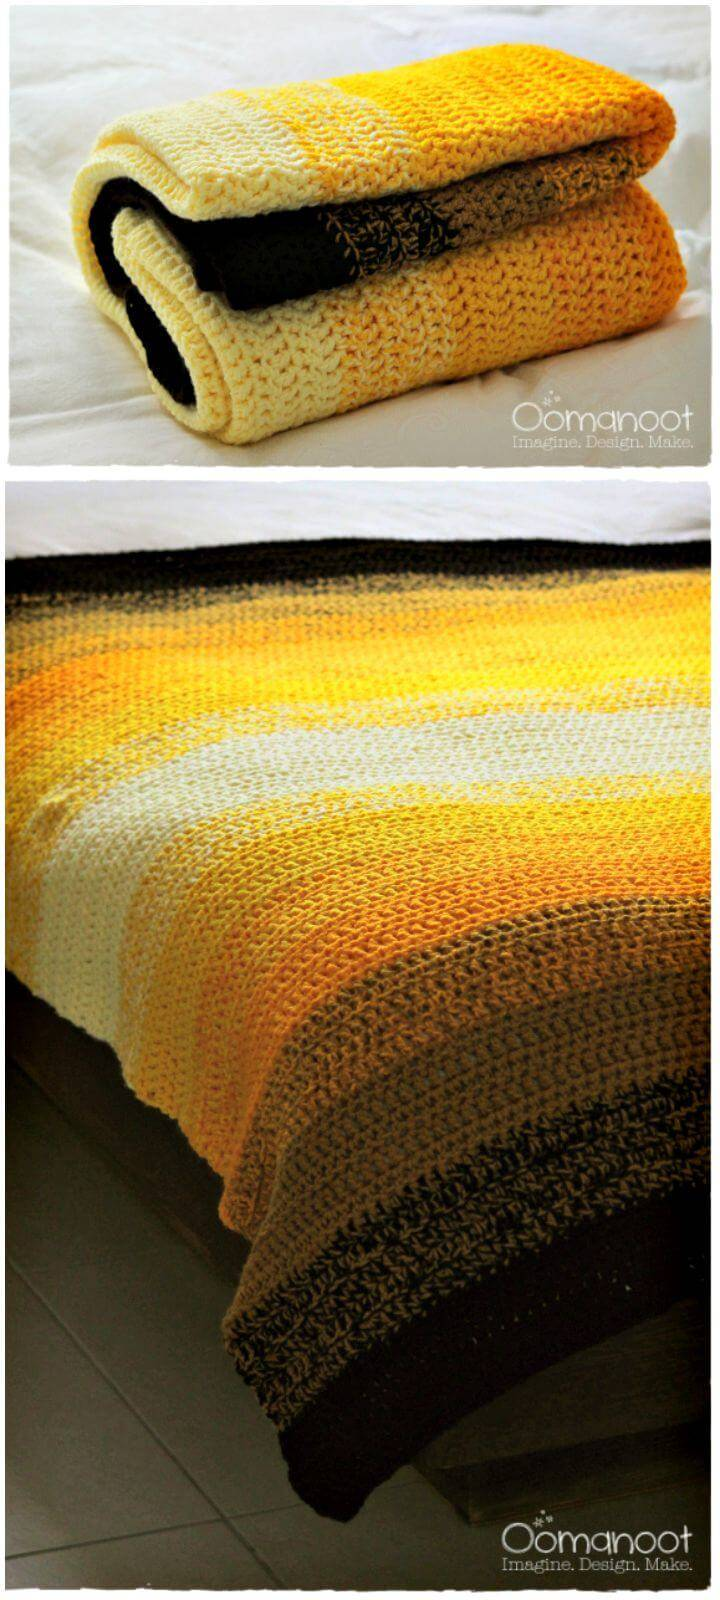 Ombre Crochet Afghan Blanket - Free Tutorial